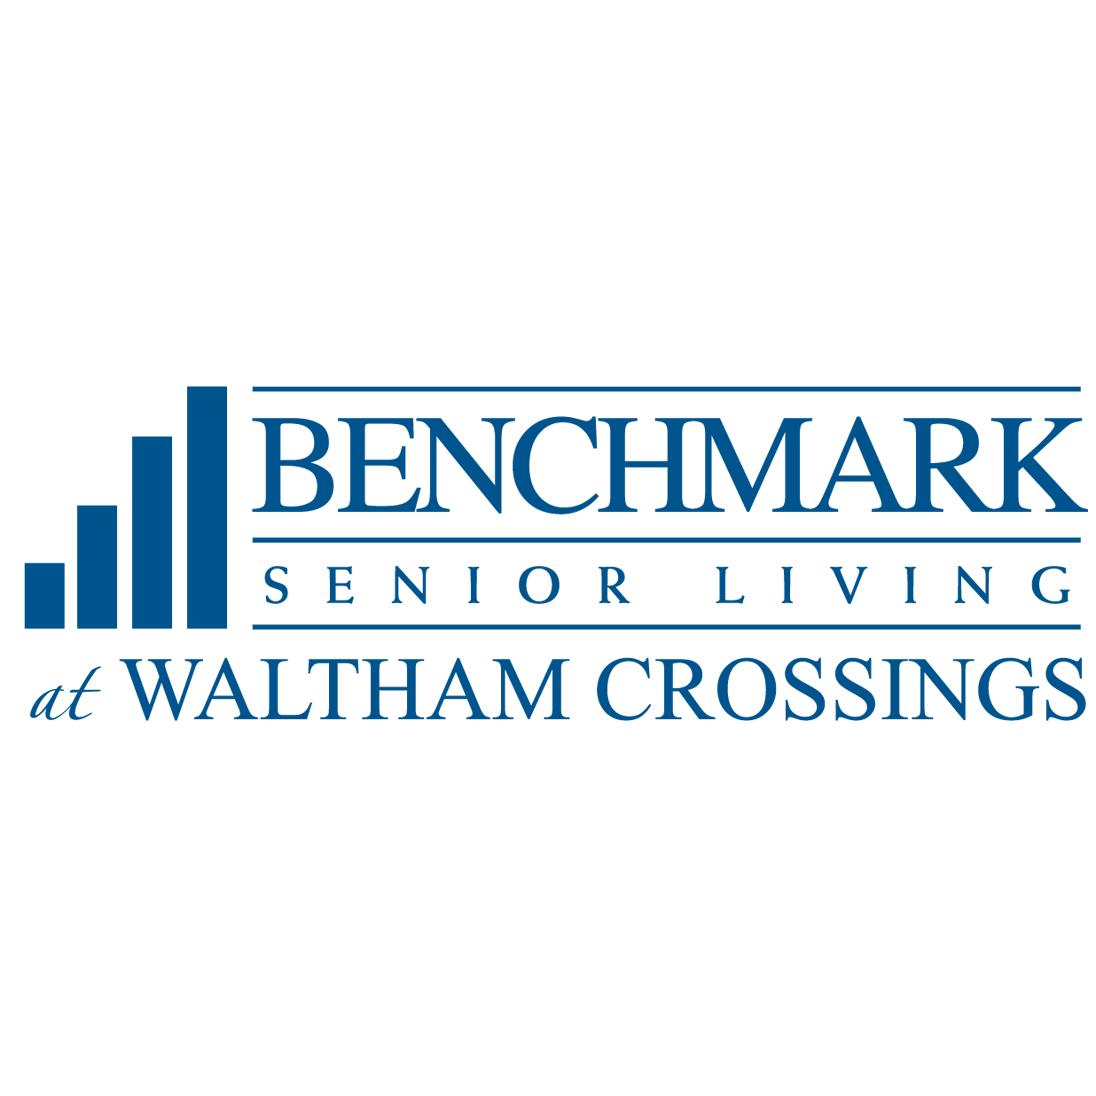 Benchmark Senior Living at Waltham Crossings